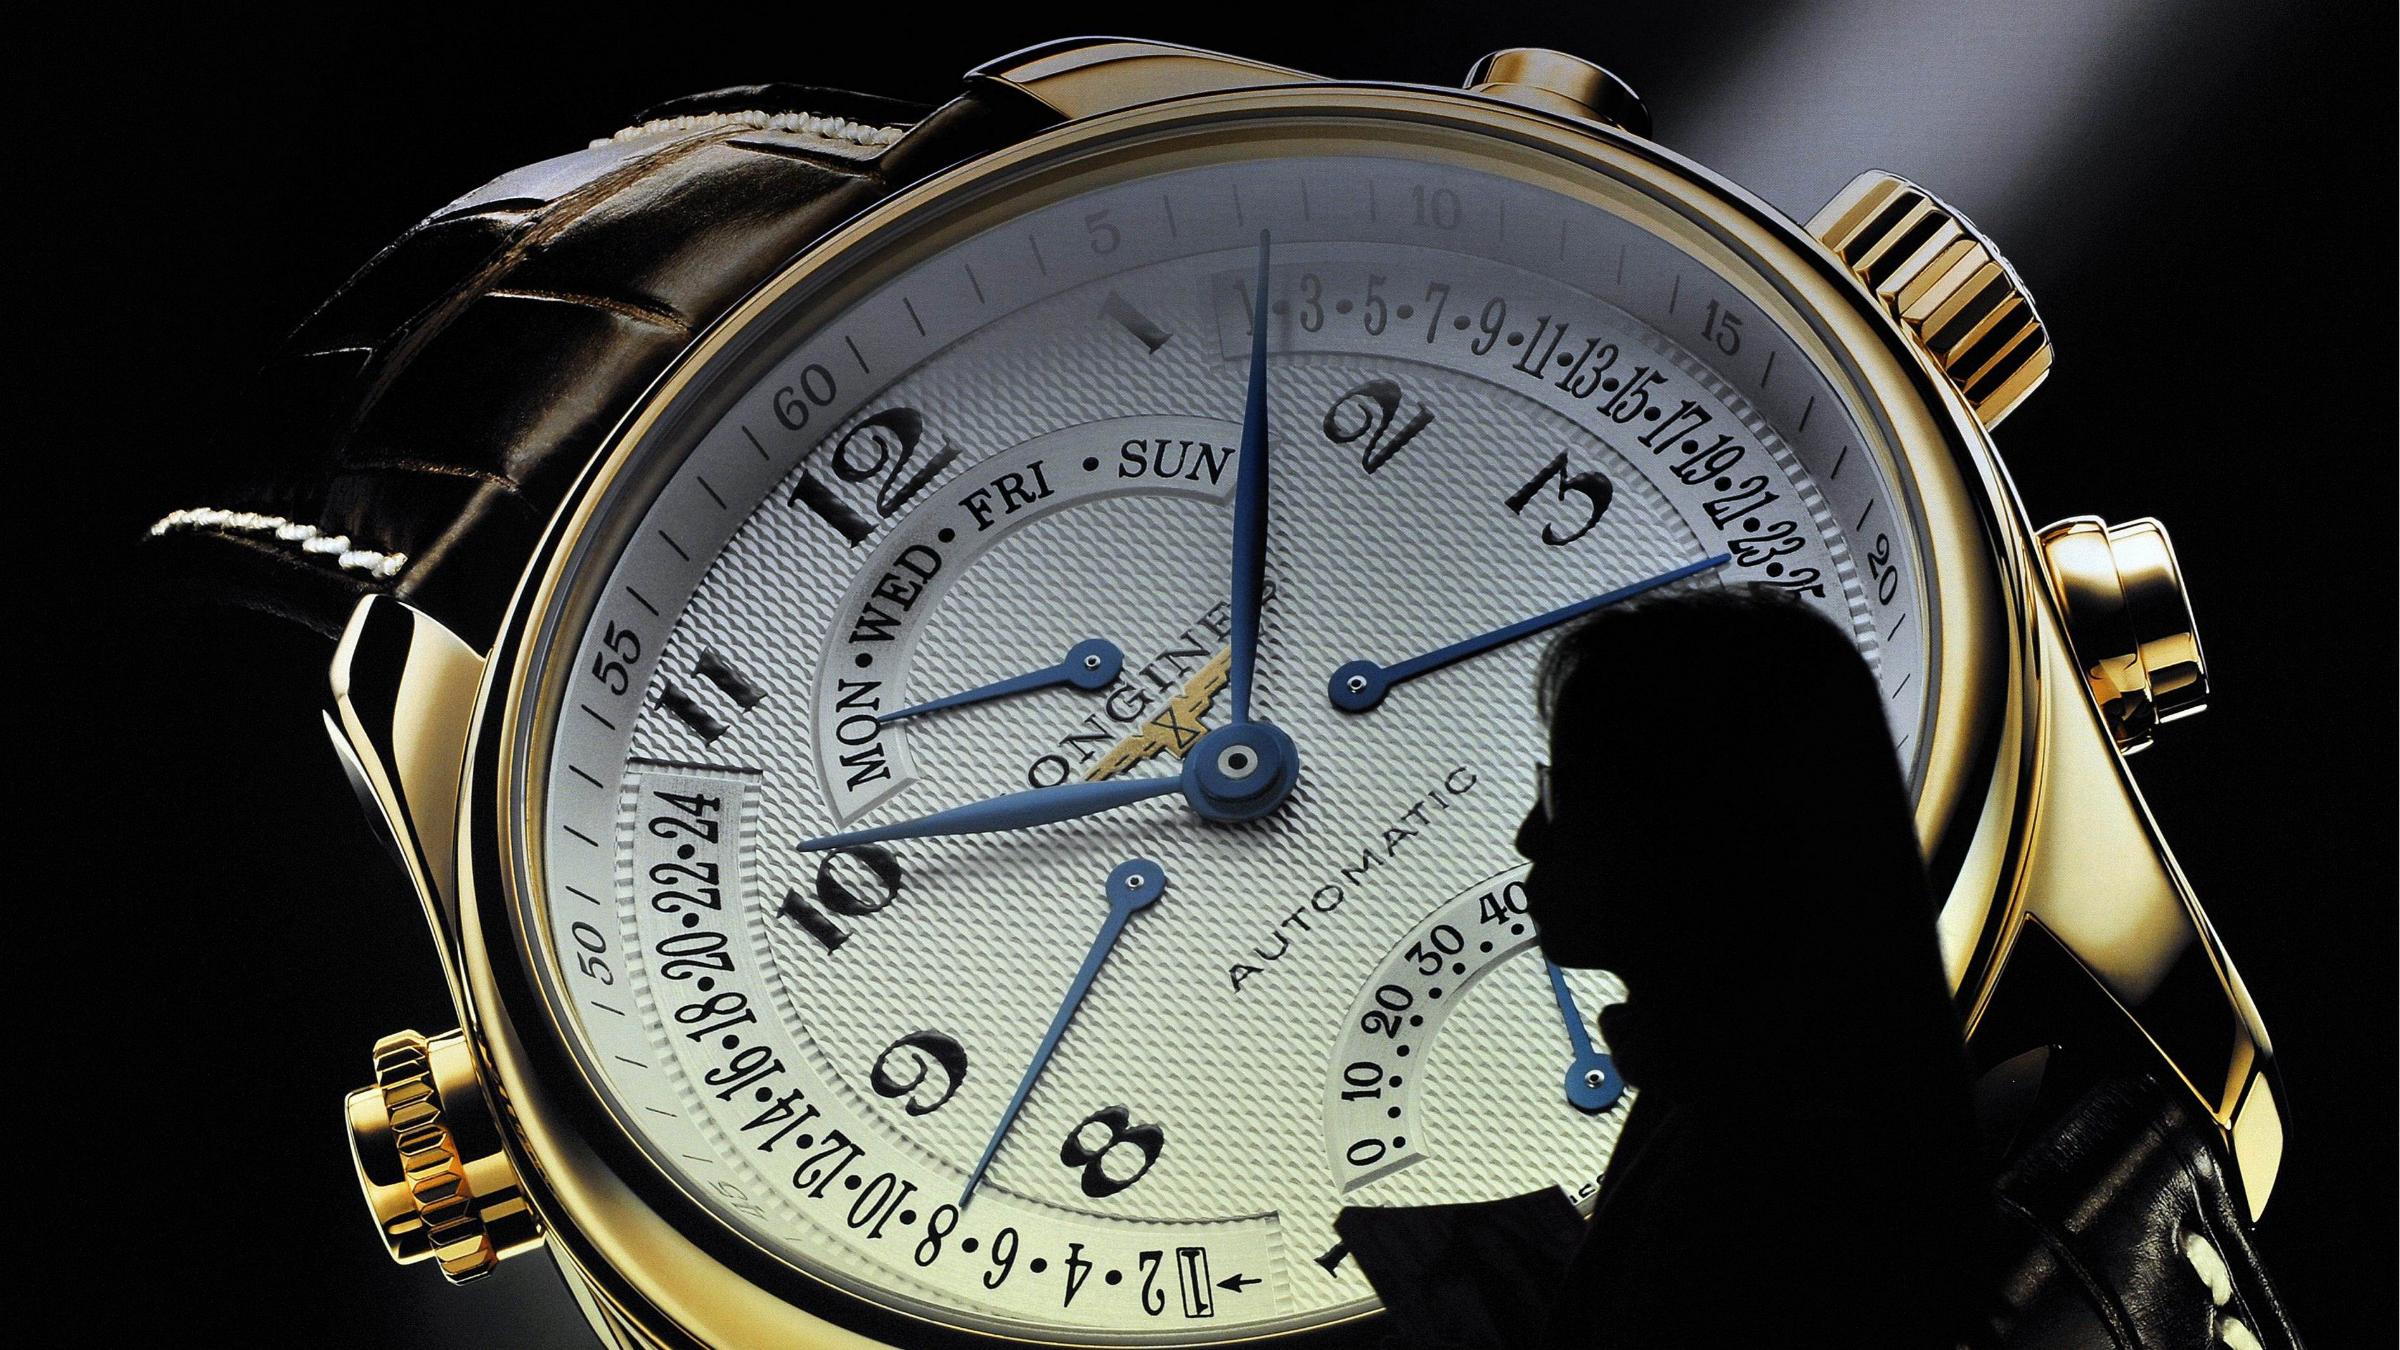 basel iii regulation turn back the clock